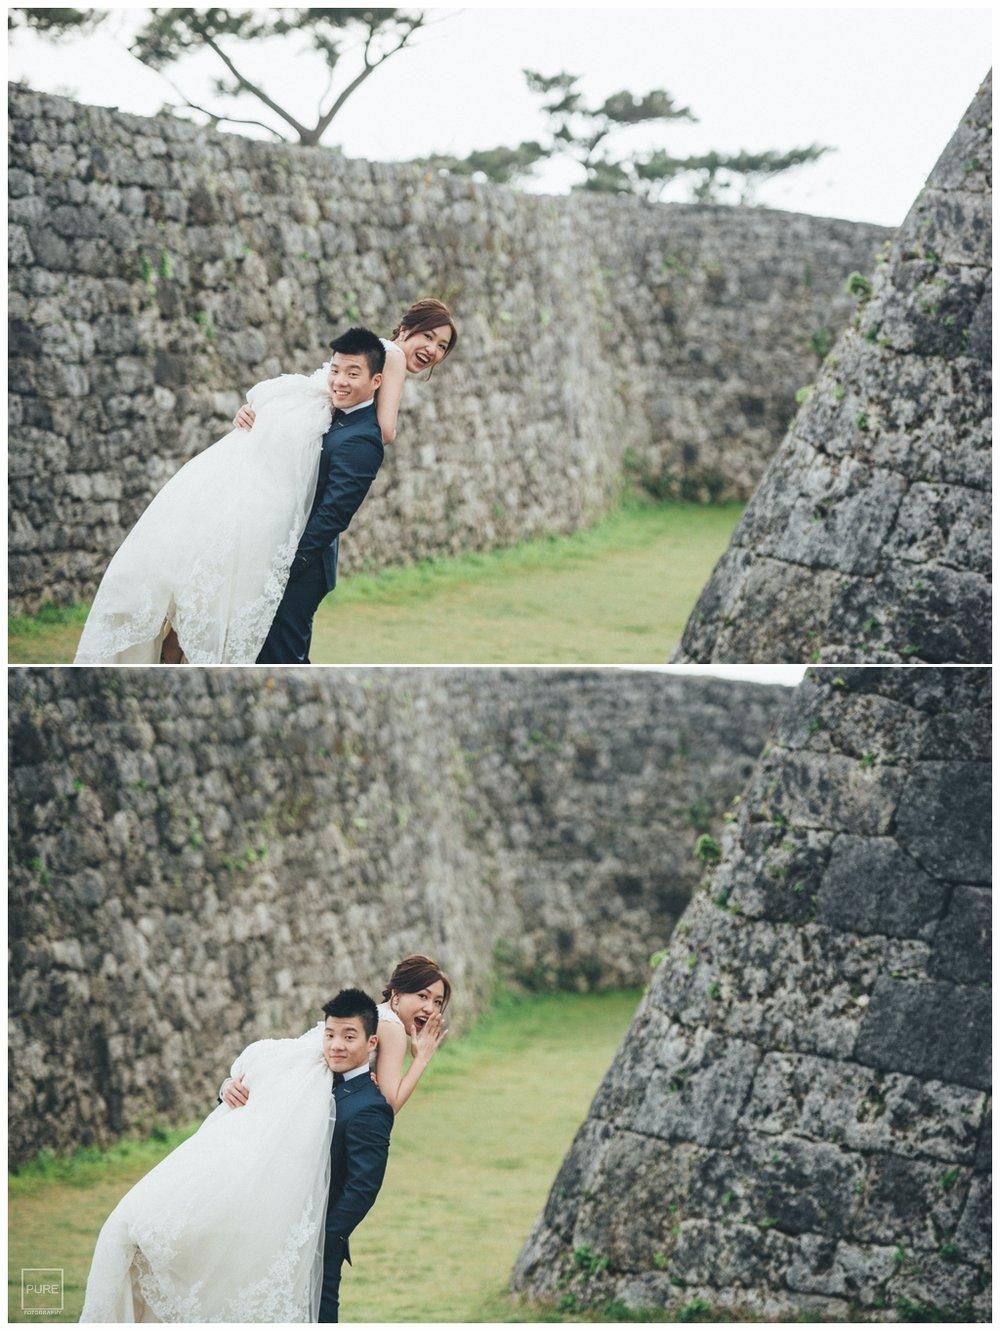 PUREFOTO_海外婚紗攝影Oversea_Prewedding_座喜味城婚紗拍攝